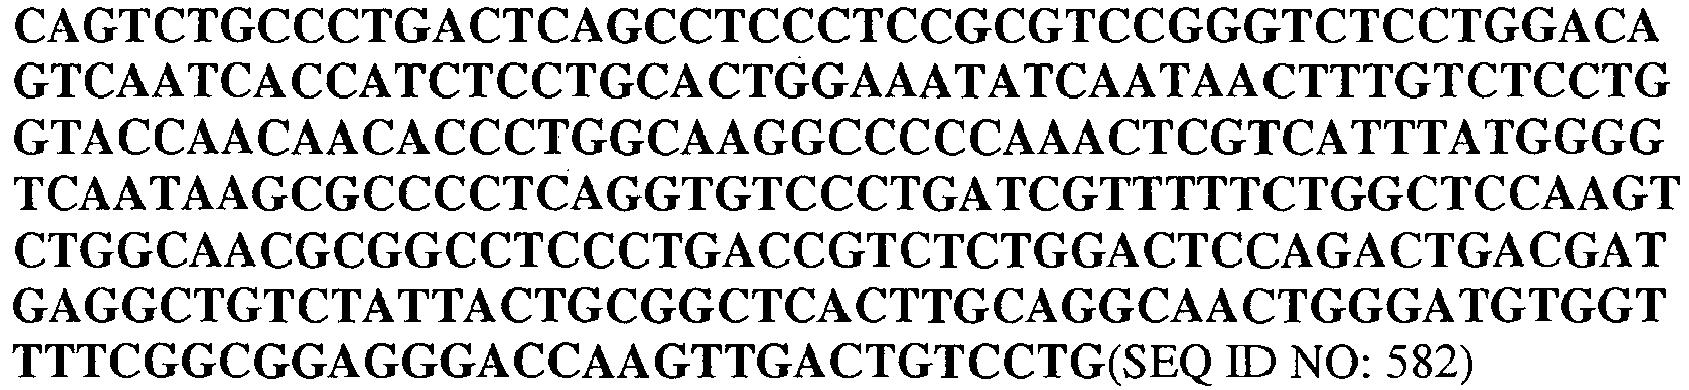 Figure imgb0342